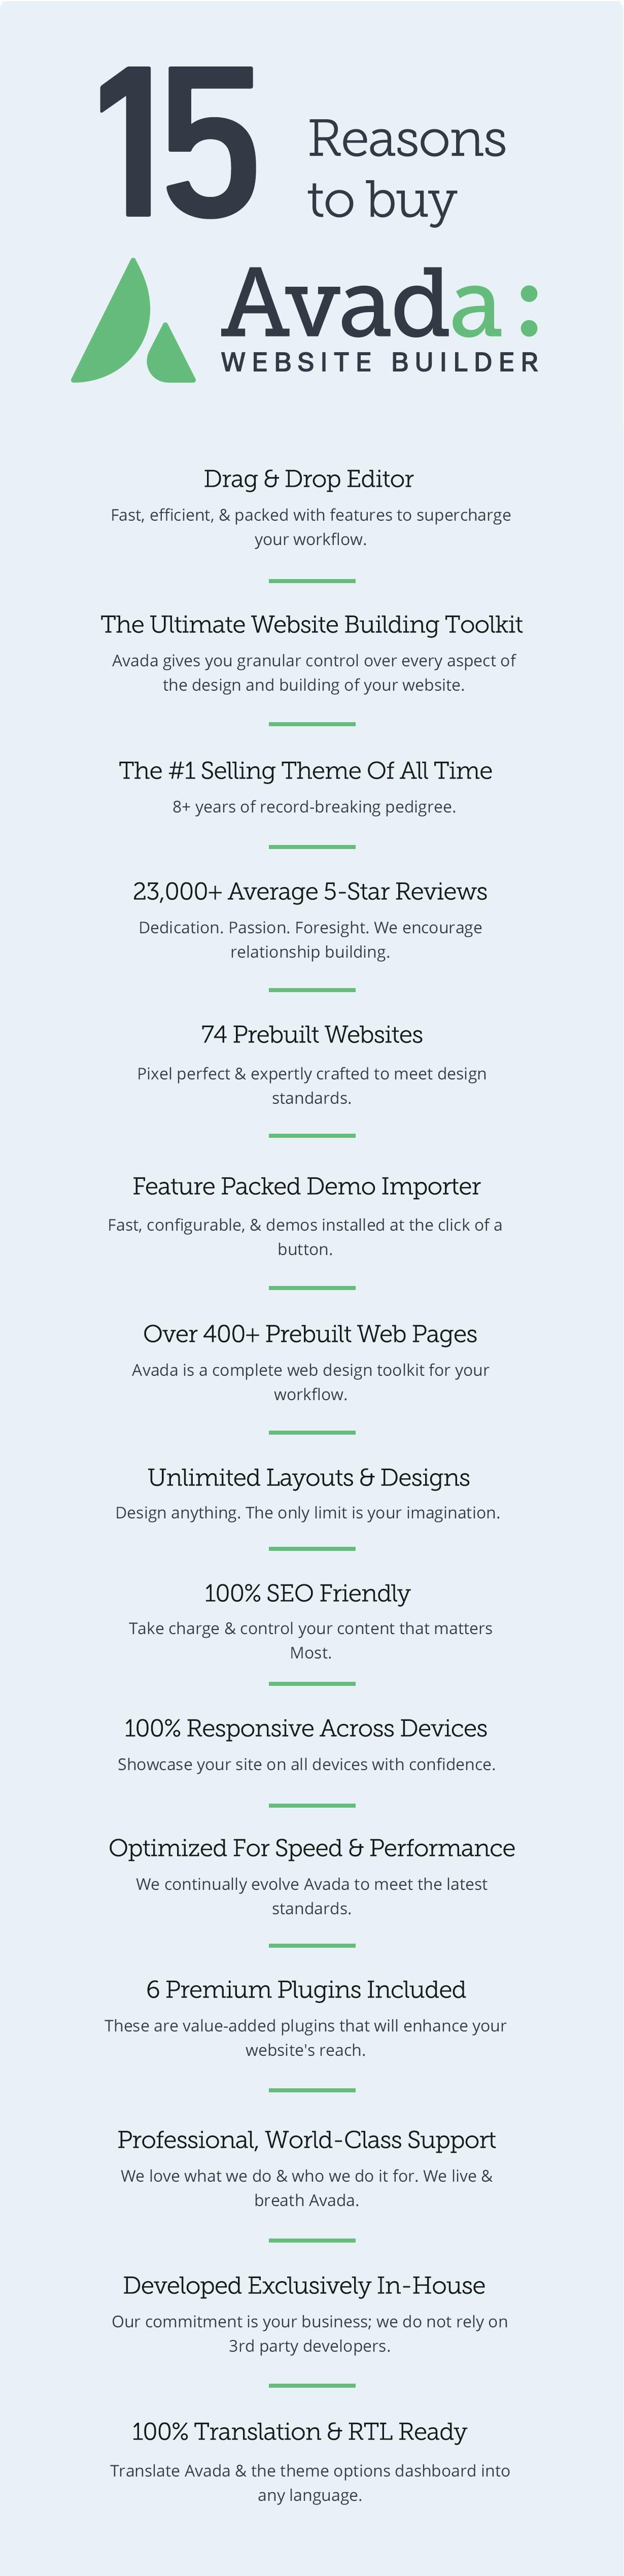 Avada | Website Builder For WordPress & WooCommerce - 28